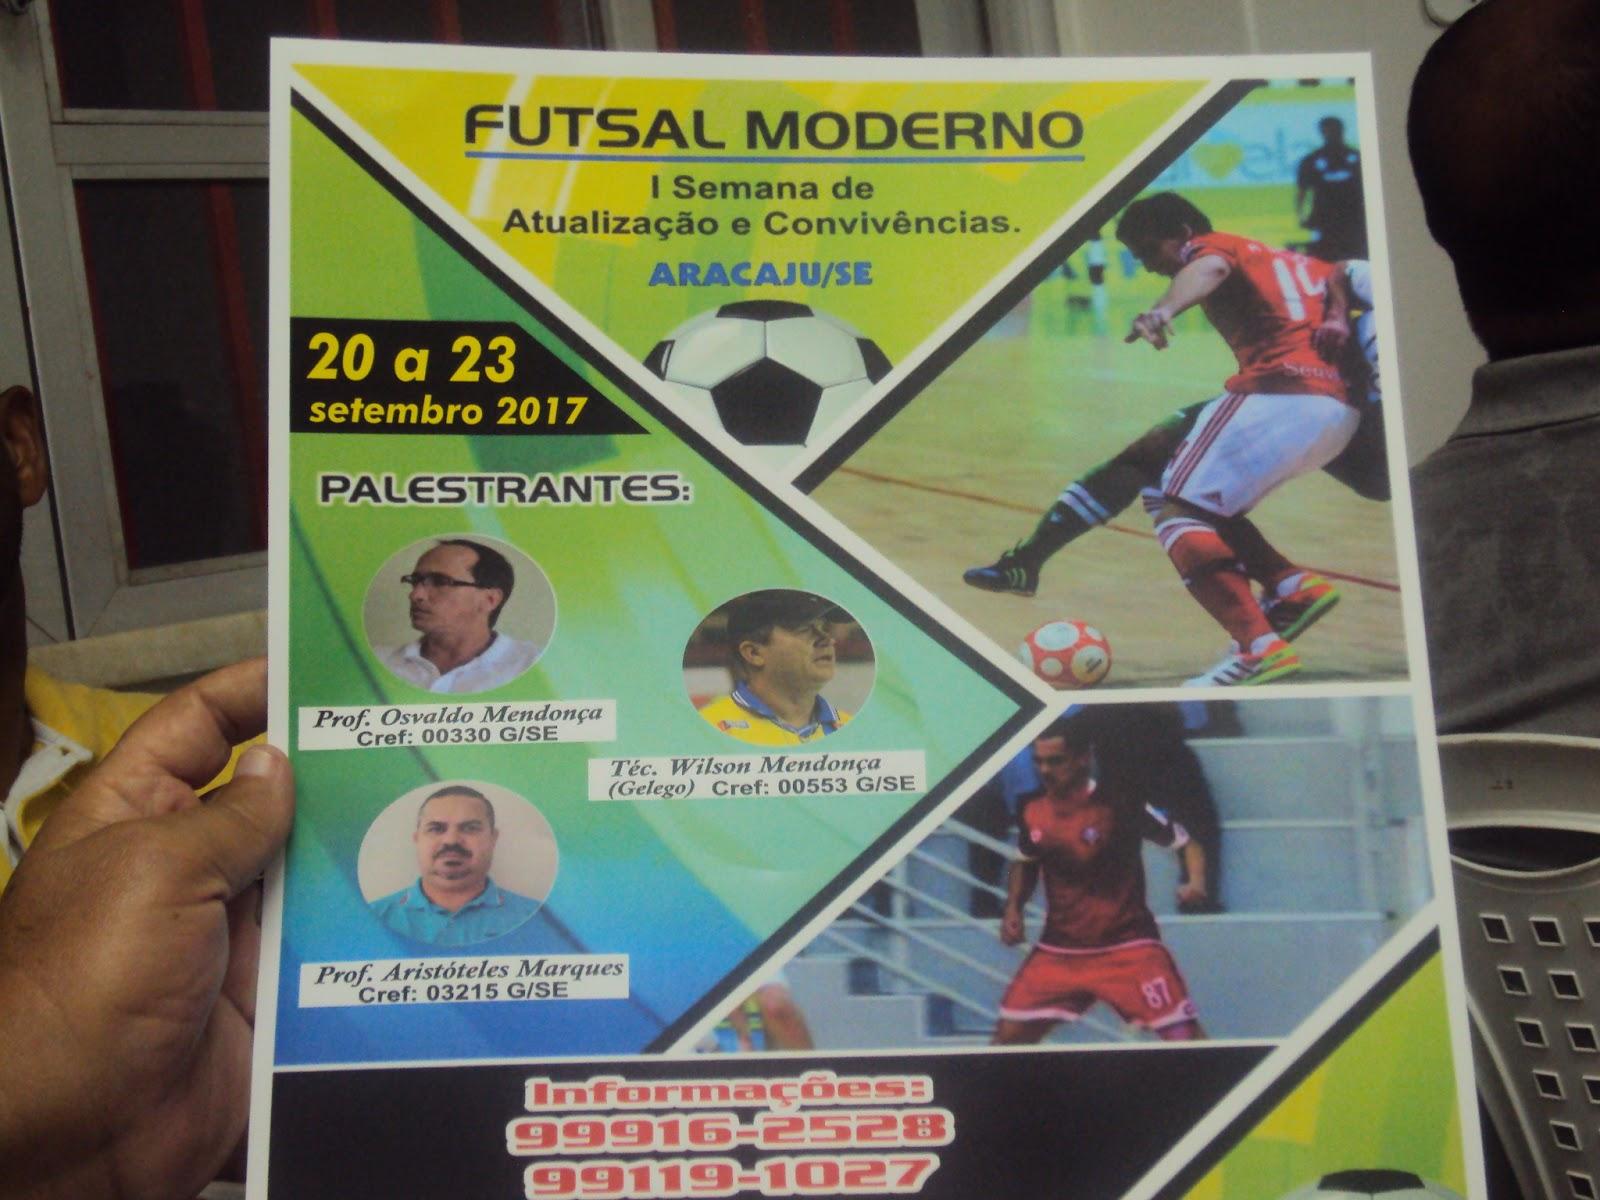 Esporte-SE  09 01 2017 - 10 01 2017 63fd42d496923